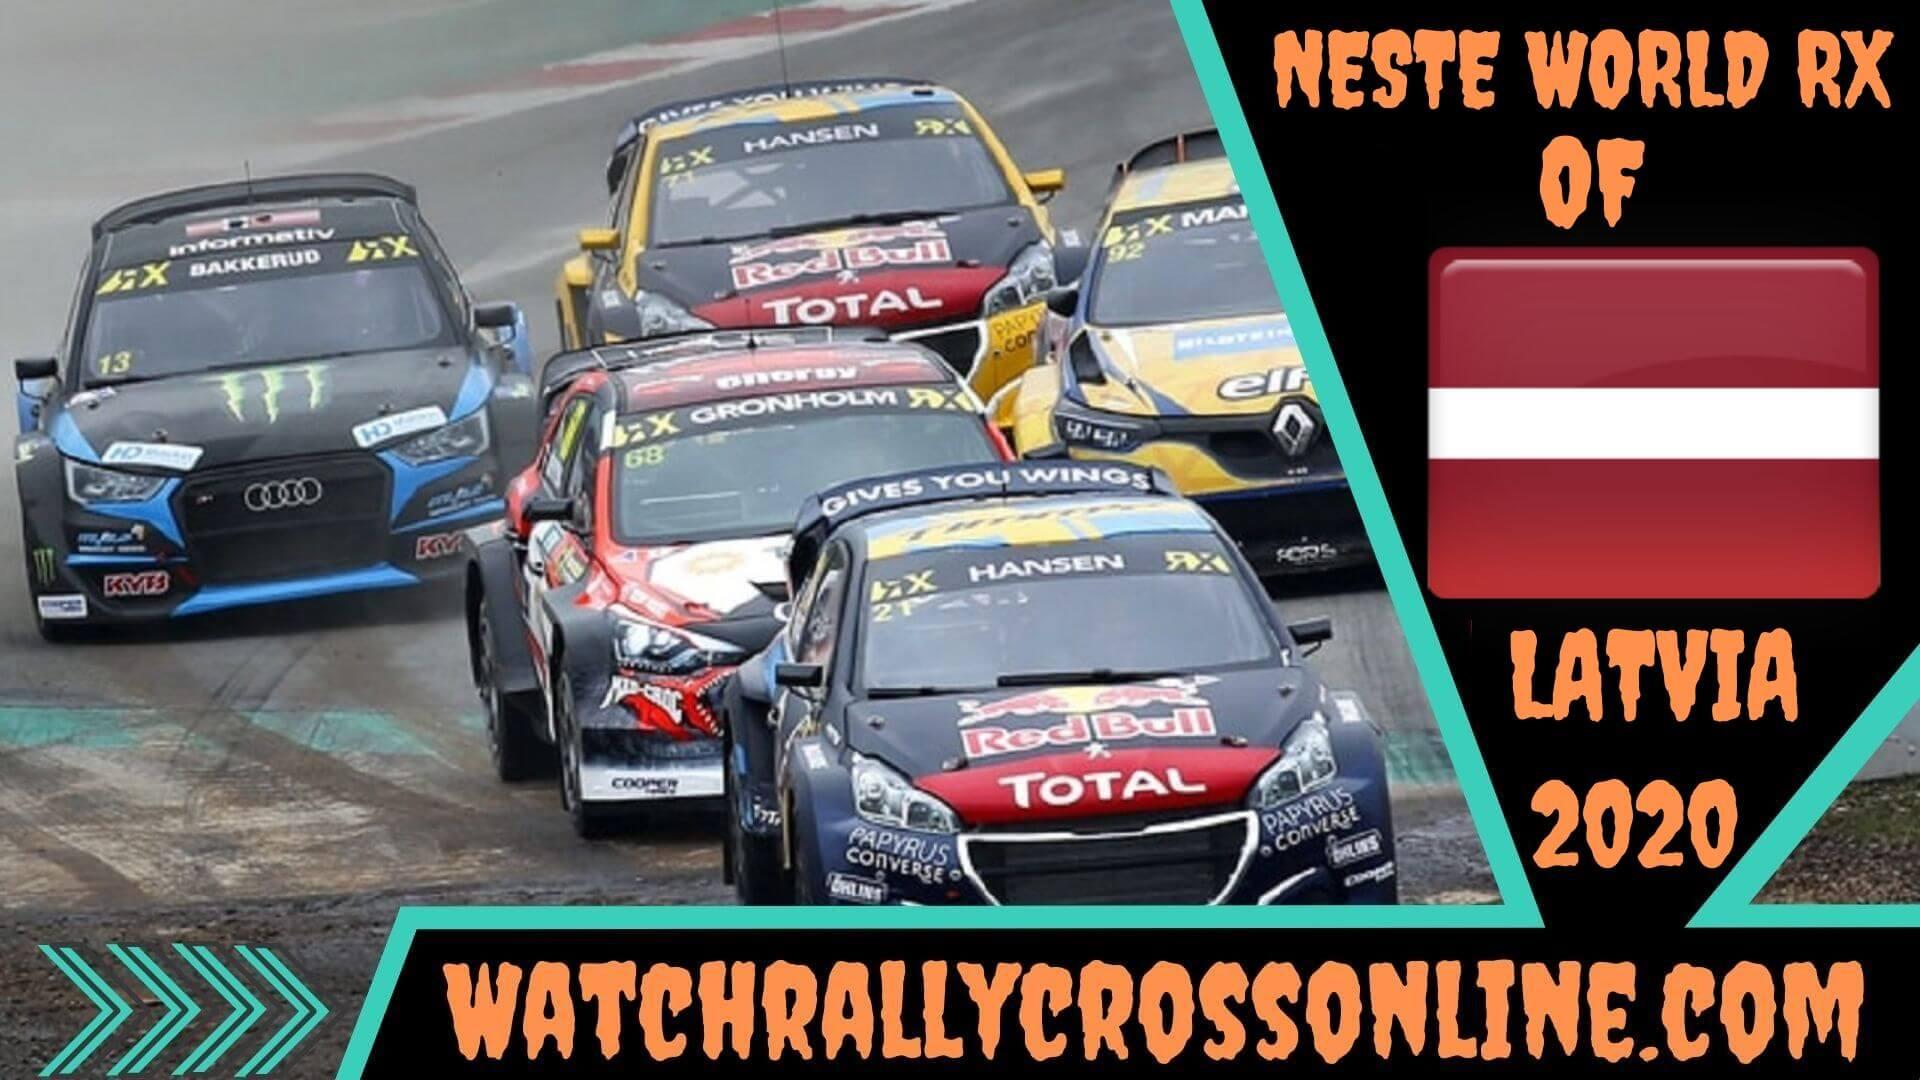 World Rallycross of Latvia Live Stream 2020 | Round 9